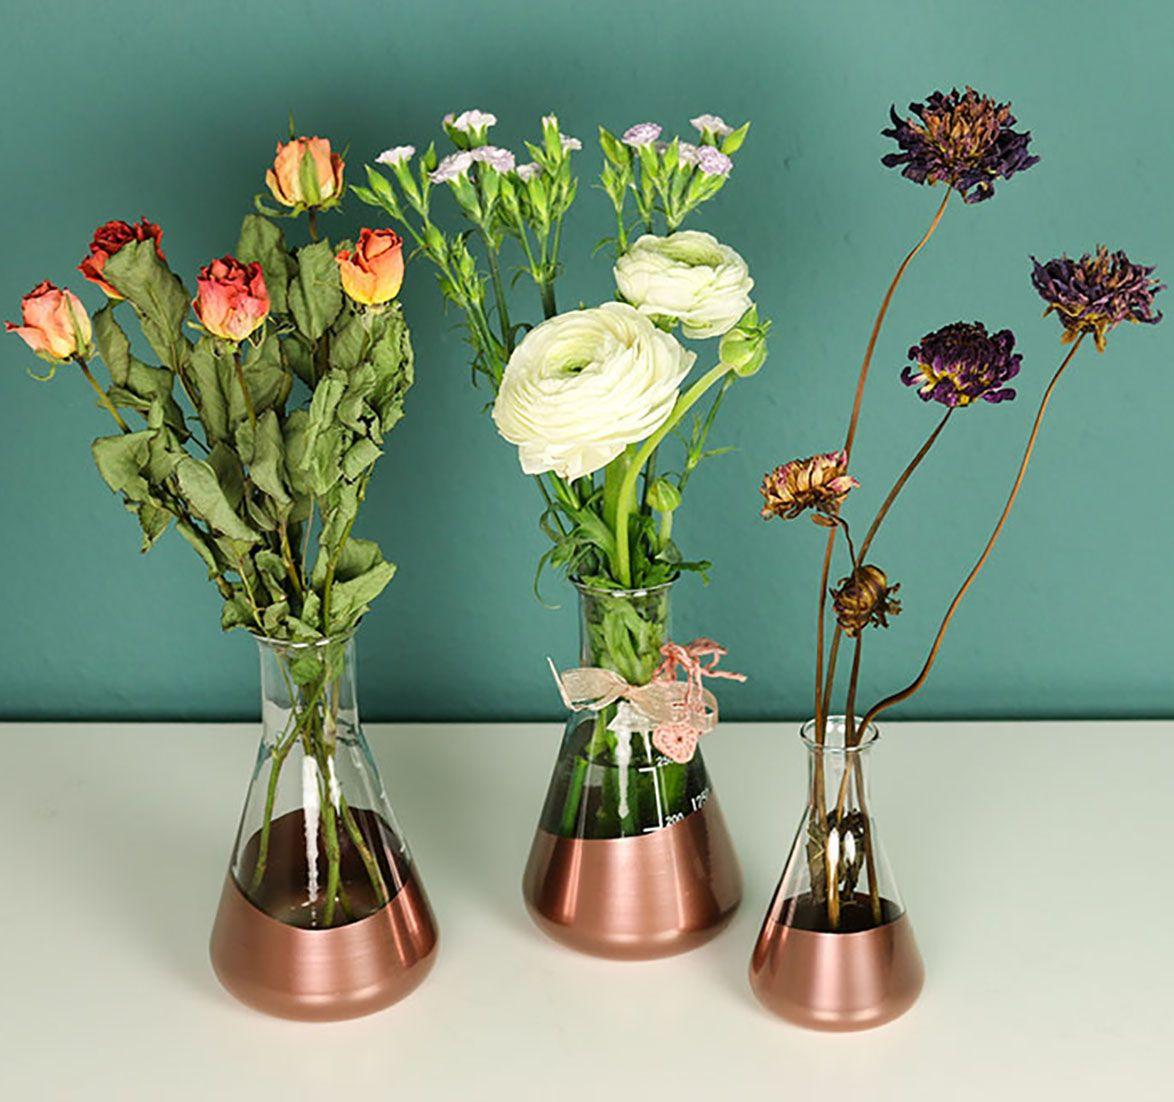 diy vasen aus erlenmeyerkolben inspiration kreation diy eigenkreation pinterest. Black Bedroom Furniture Sets. Home Design Ideas